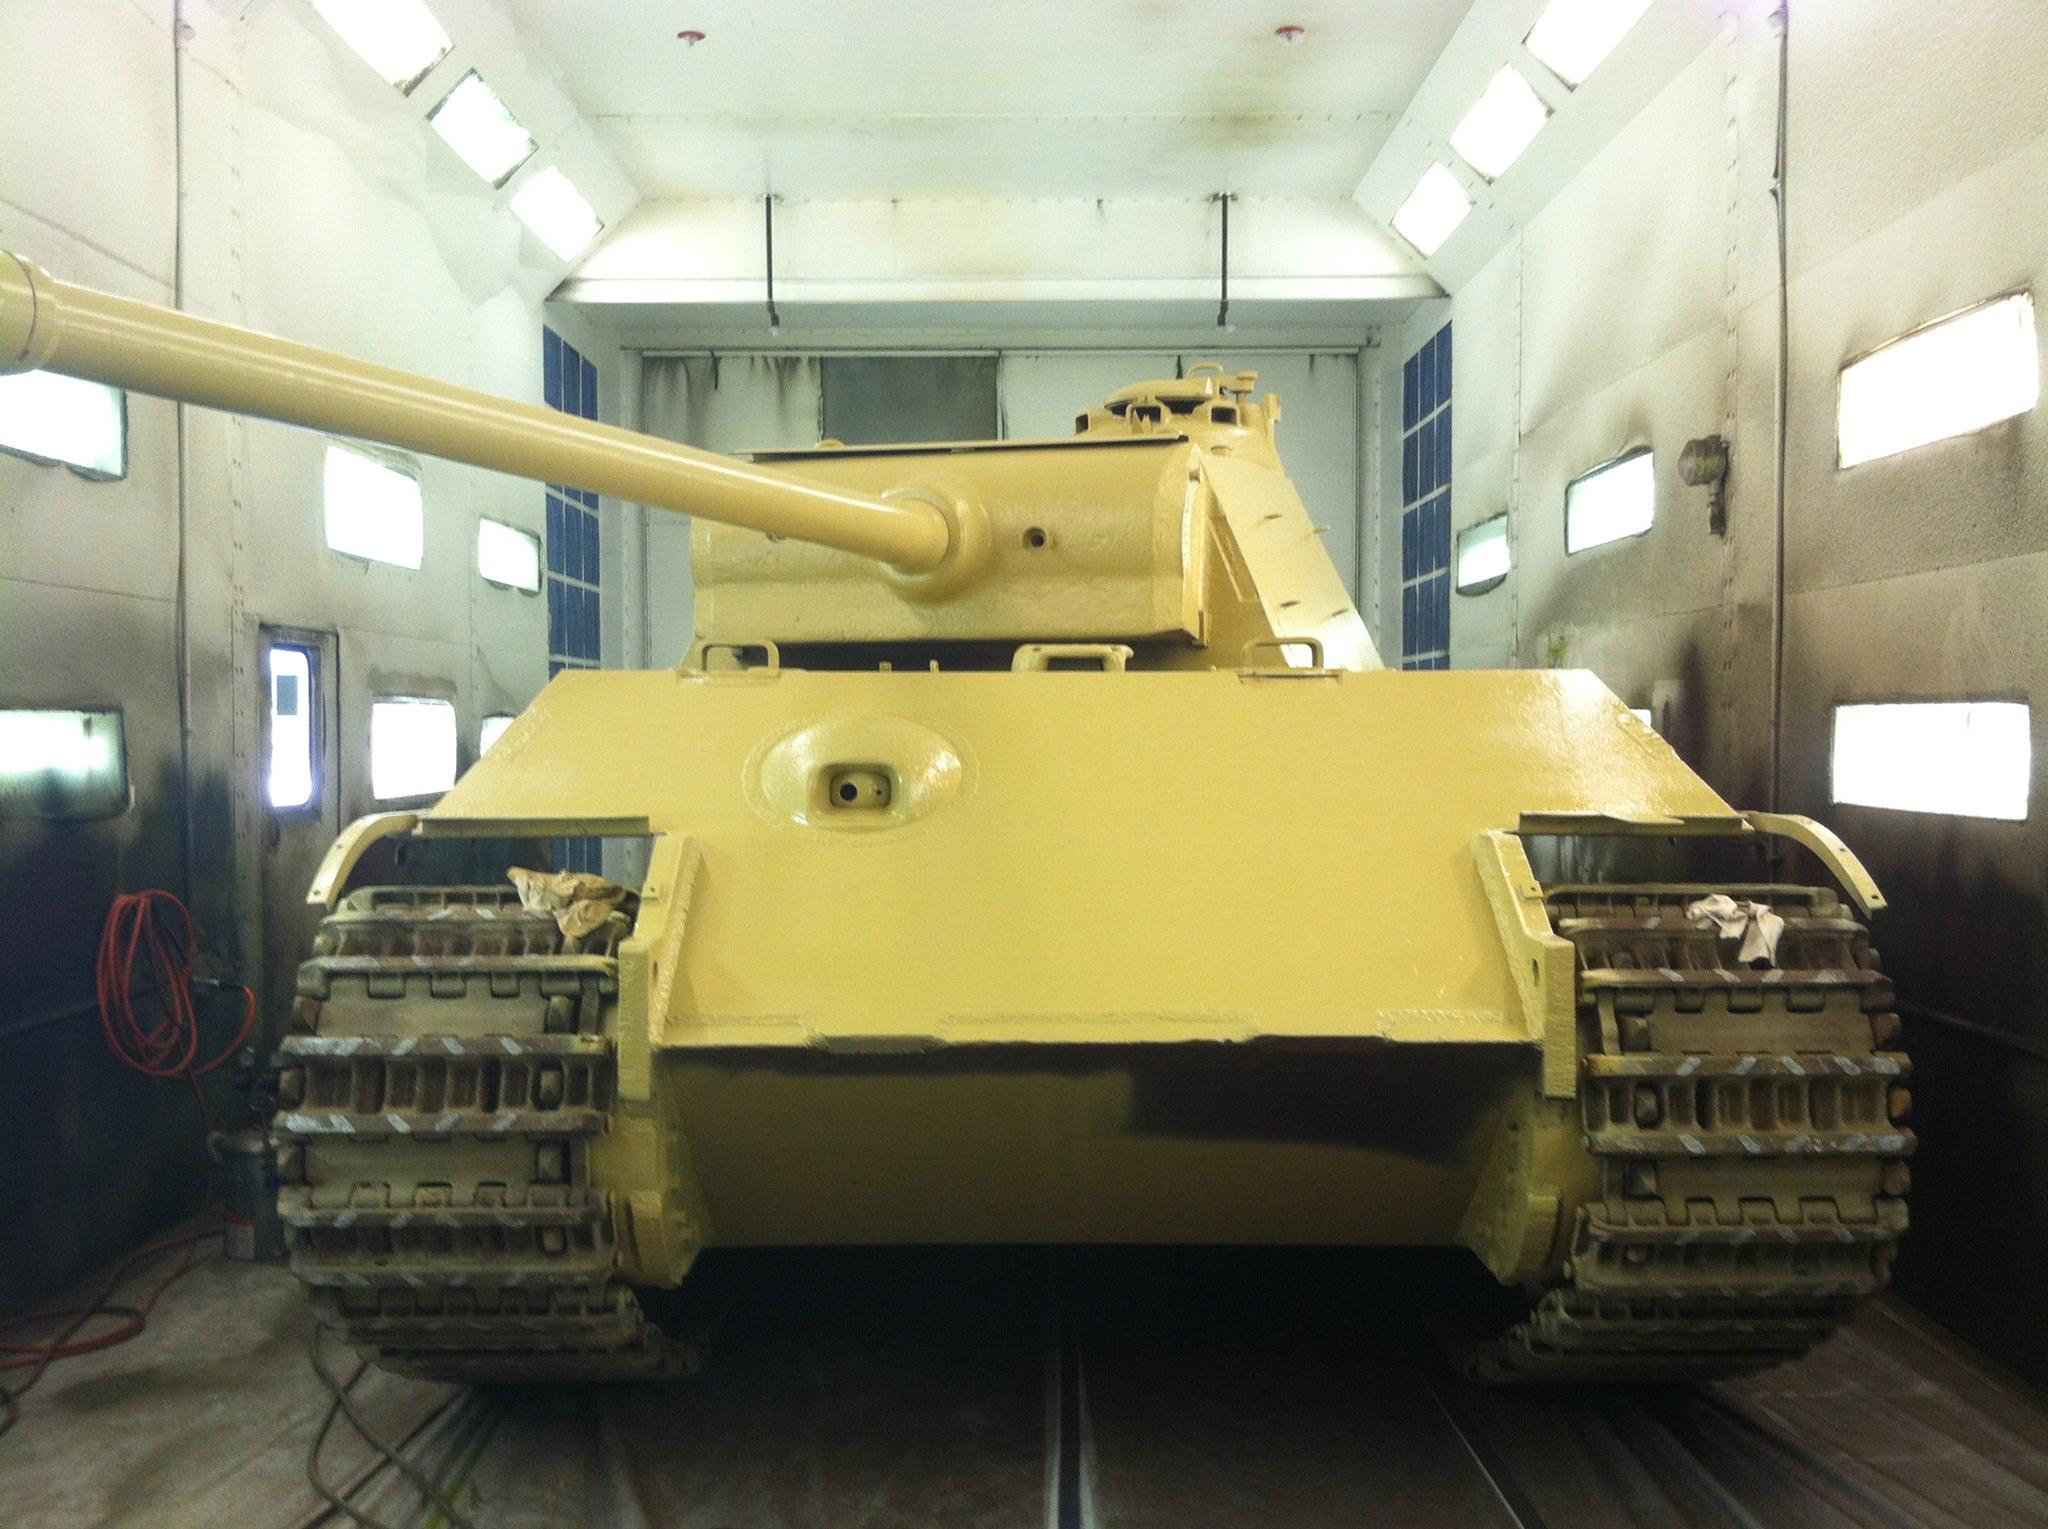 a9c917c4678c0f Panther II prototype has new fresh coat of paint! - 14 impressive images